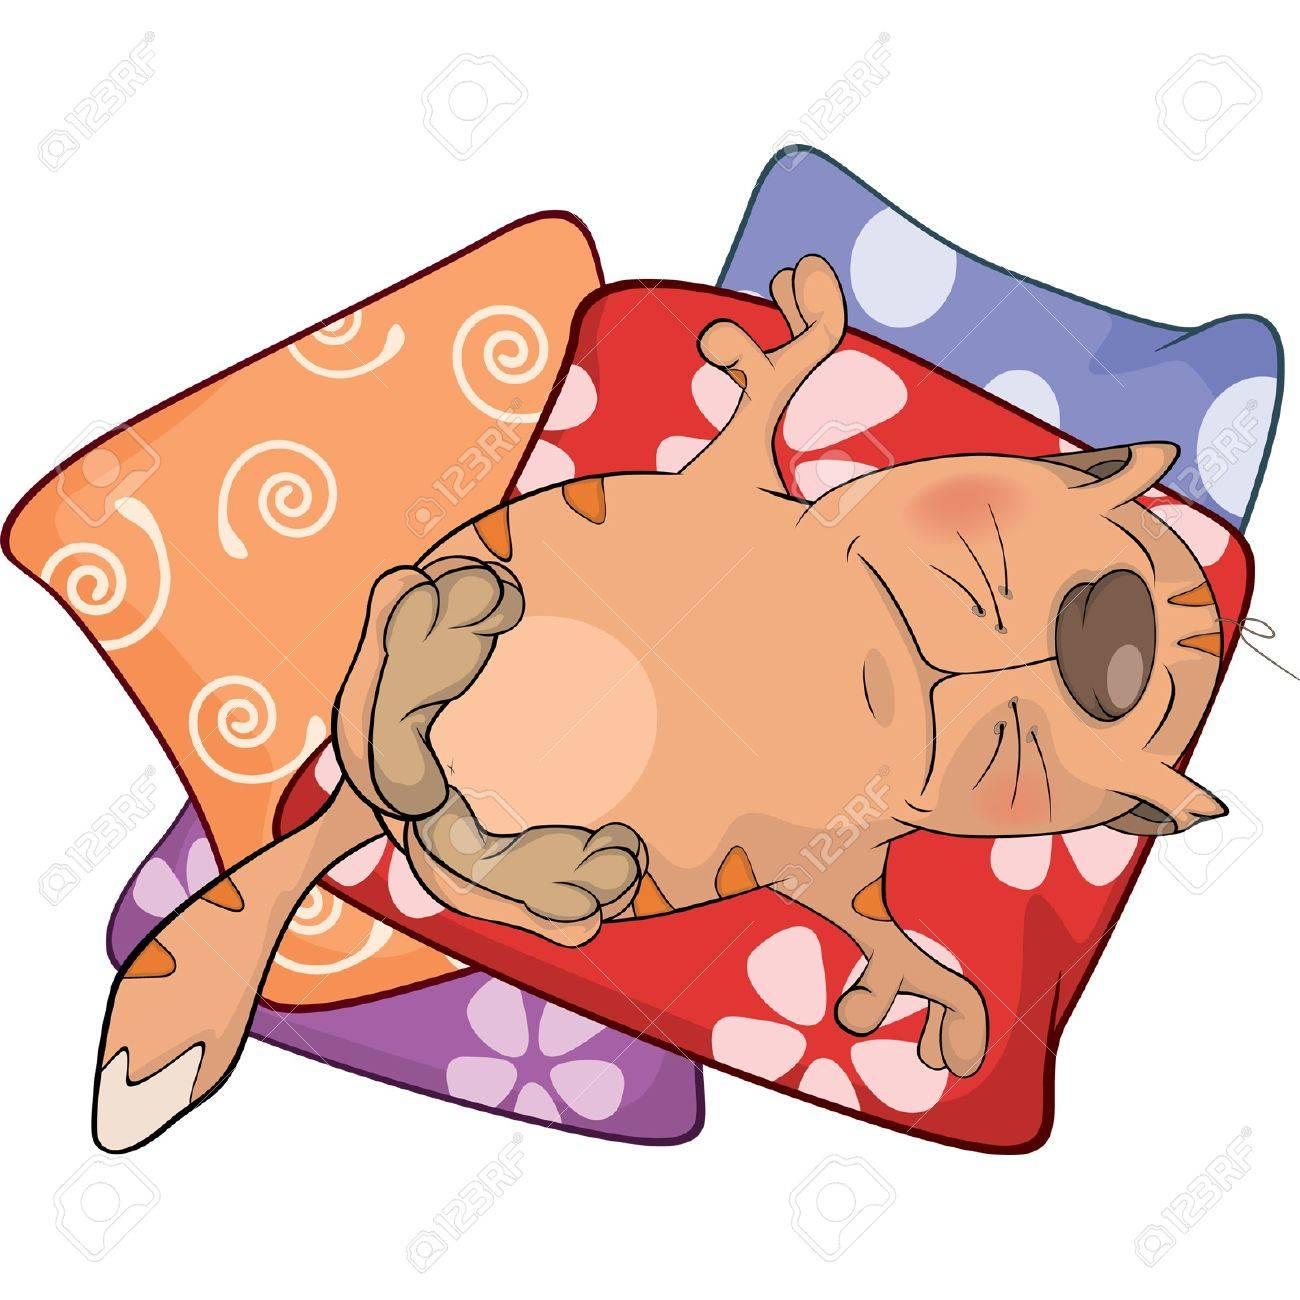 Cat on pillows. Cartoon Stock Vector - 18634319